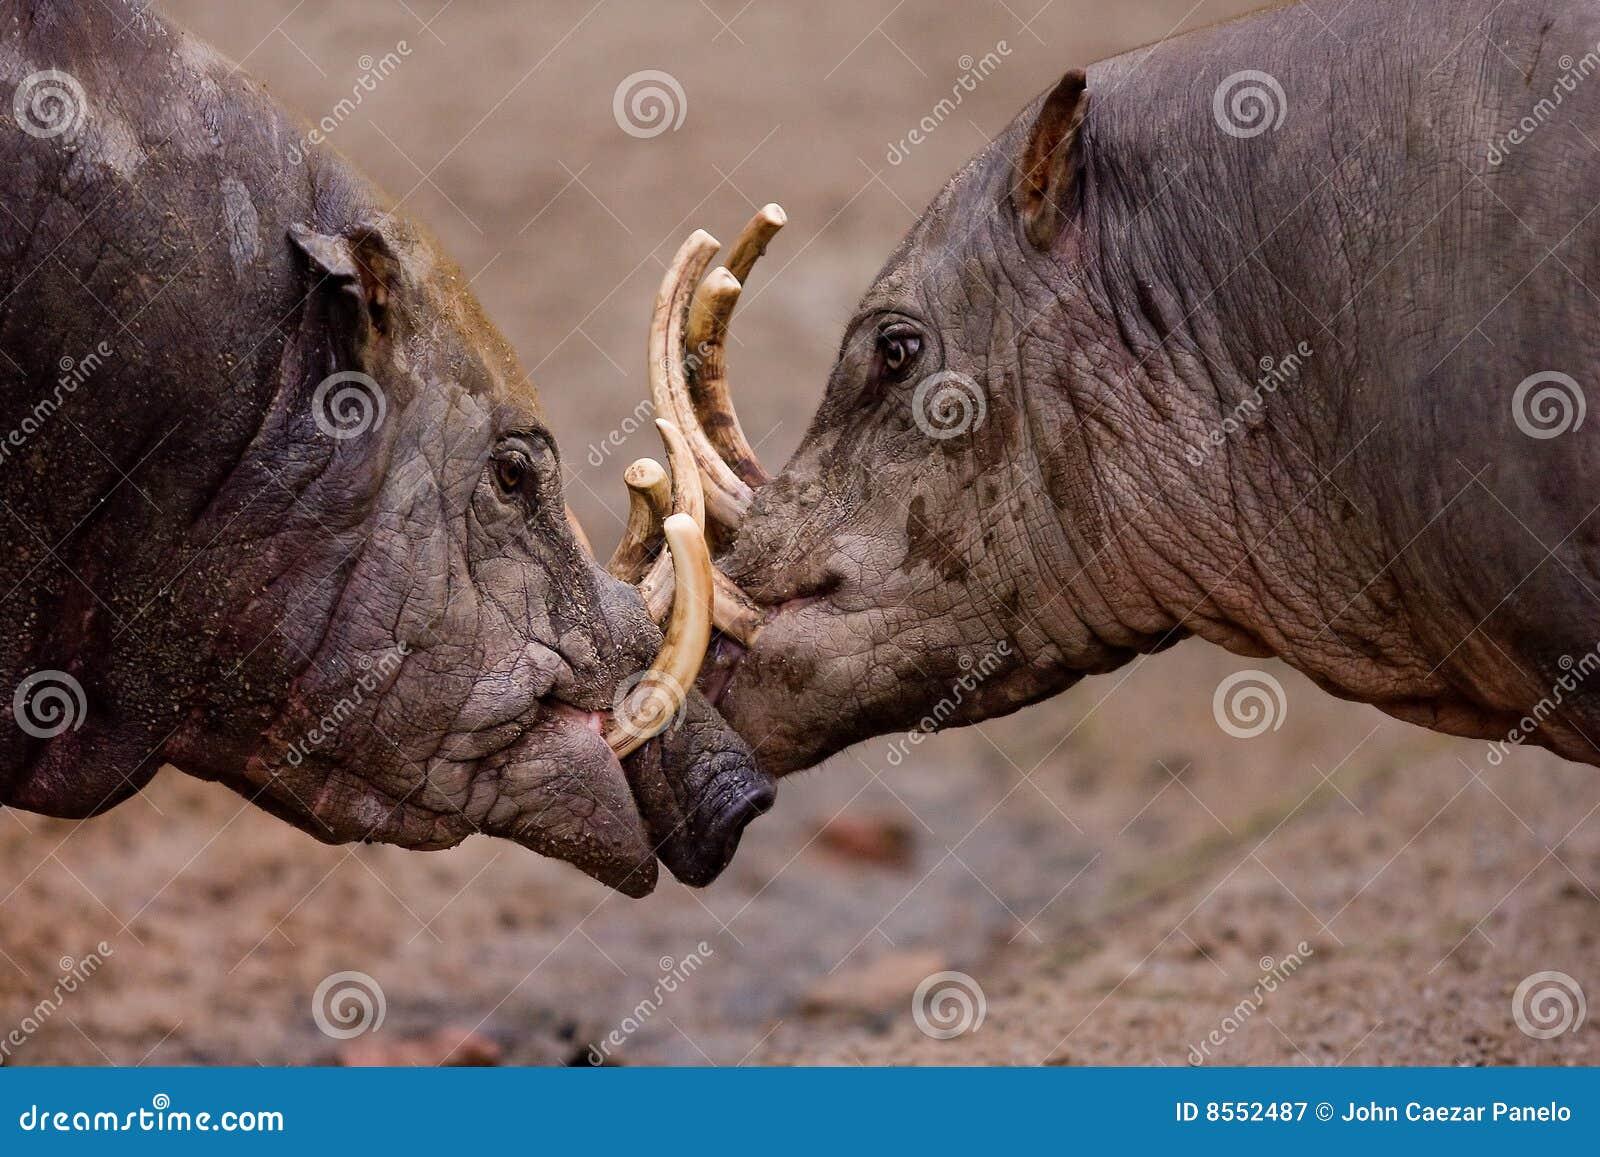 fighting-wild-boars-8552487.jpg